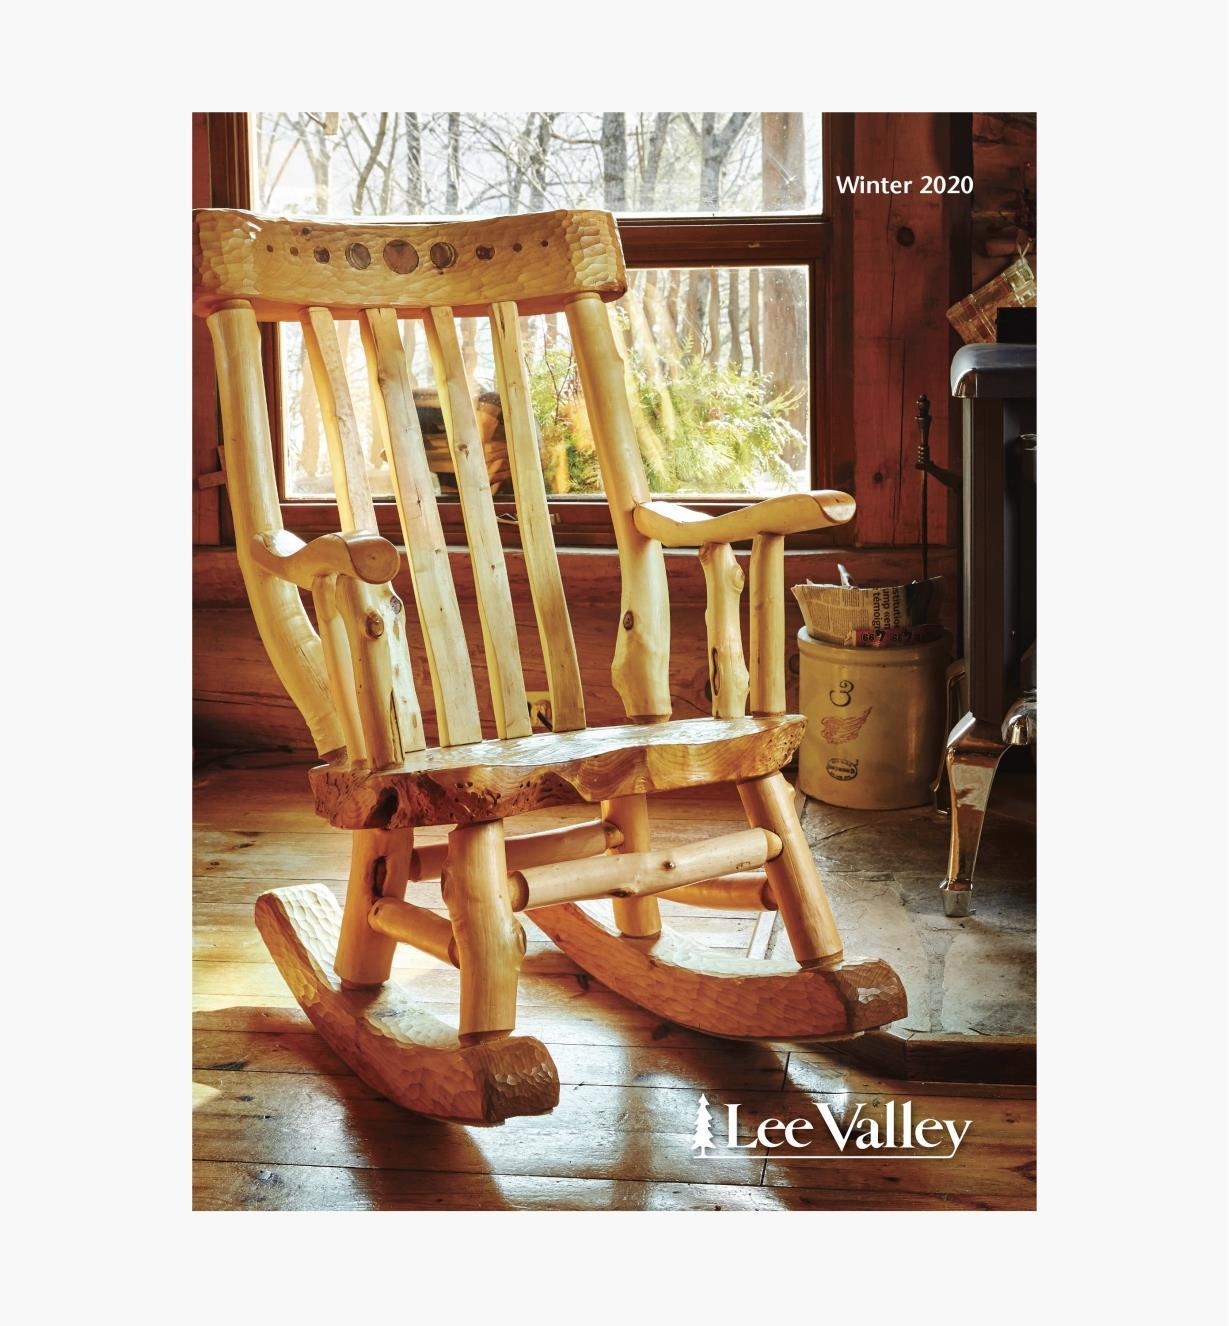 U0120W - Winter 2020 Woodworking